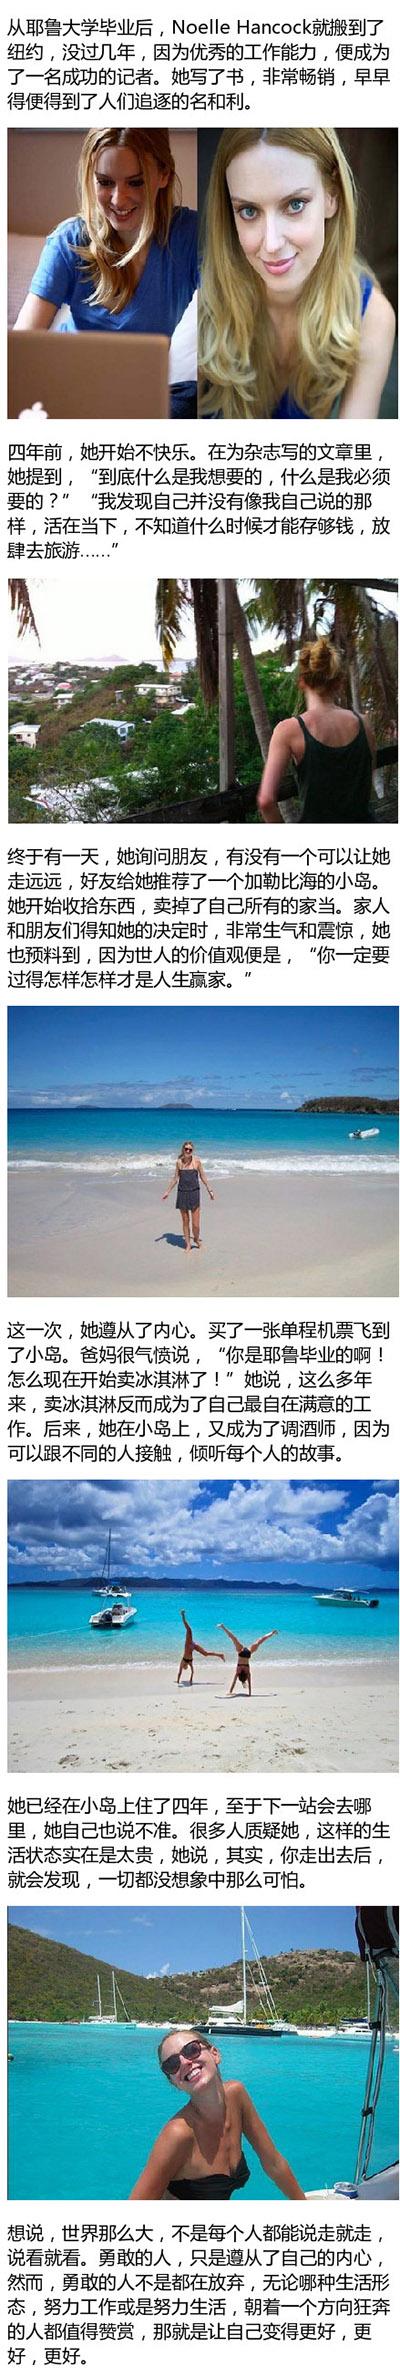 http://static.oschina.net/uploads/space/2015/0504/181238_gFz5_2306979.jpg